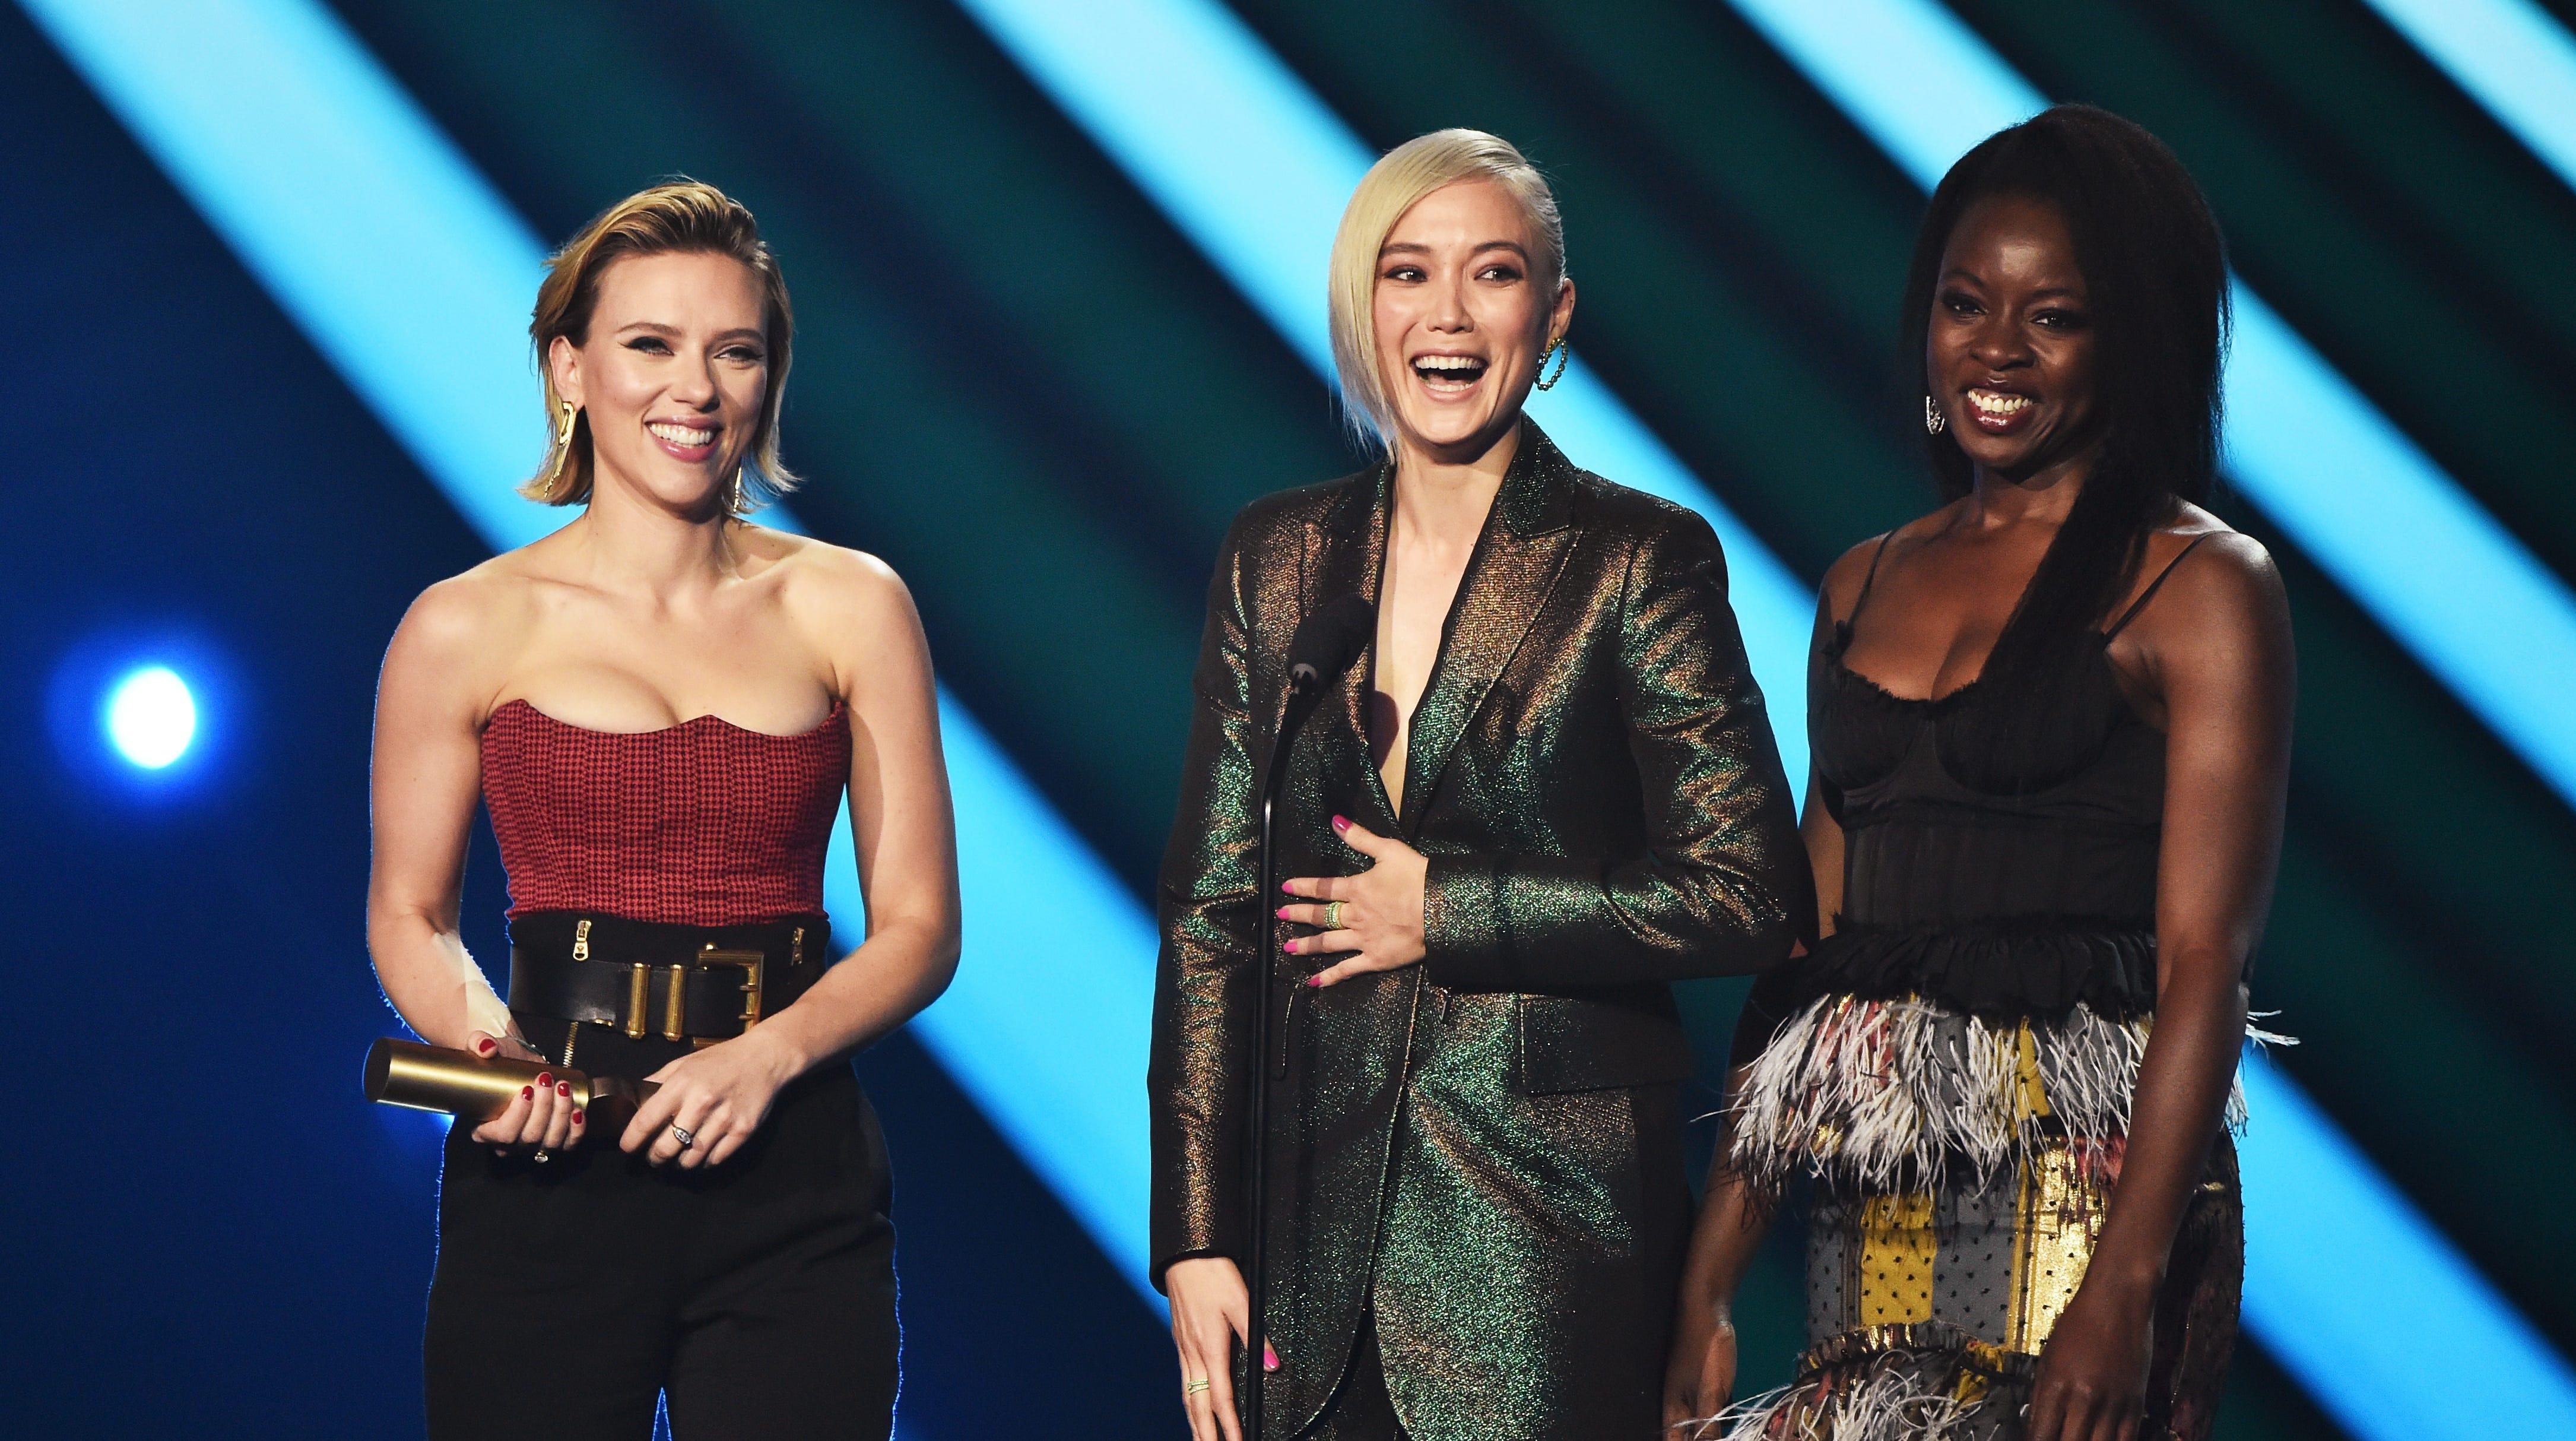 Resultado de imagen para people's choice awards 2018 avengers